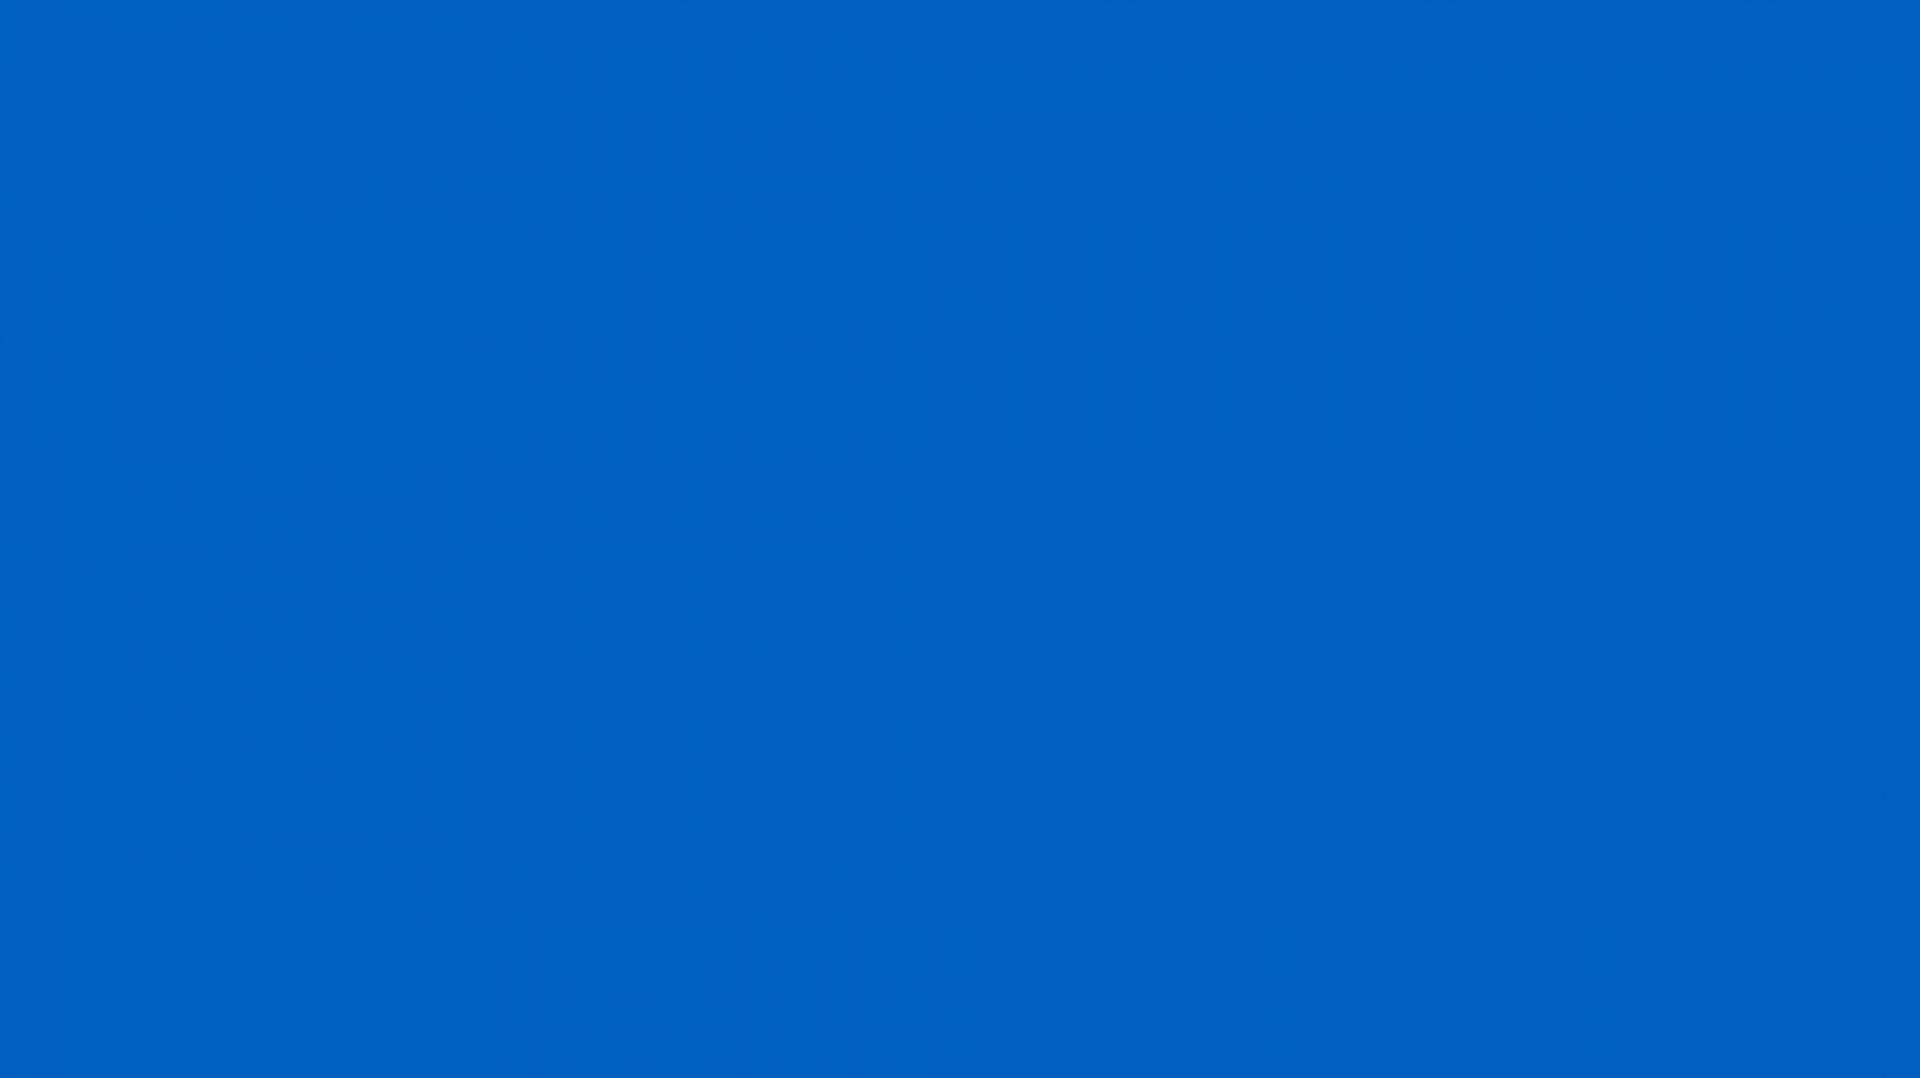 LVRK – Liegenschaftsverwaltung